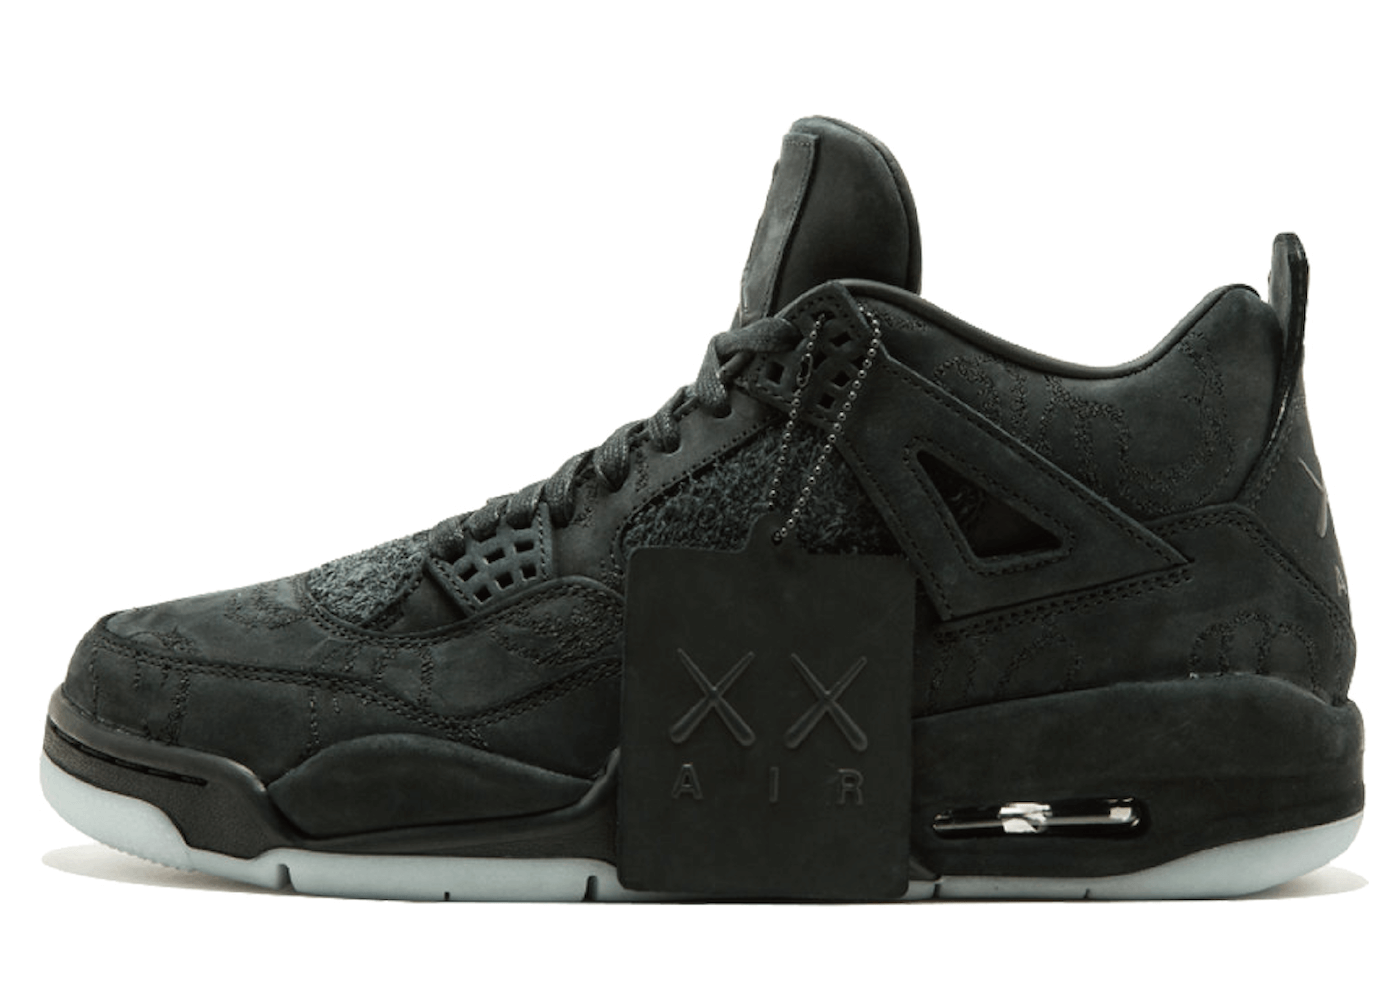 Kaws × Nike Air Jordan 4 Retro Blackの写真